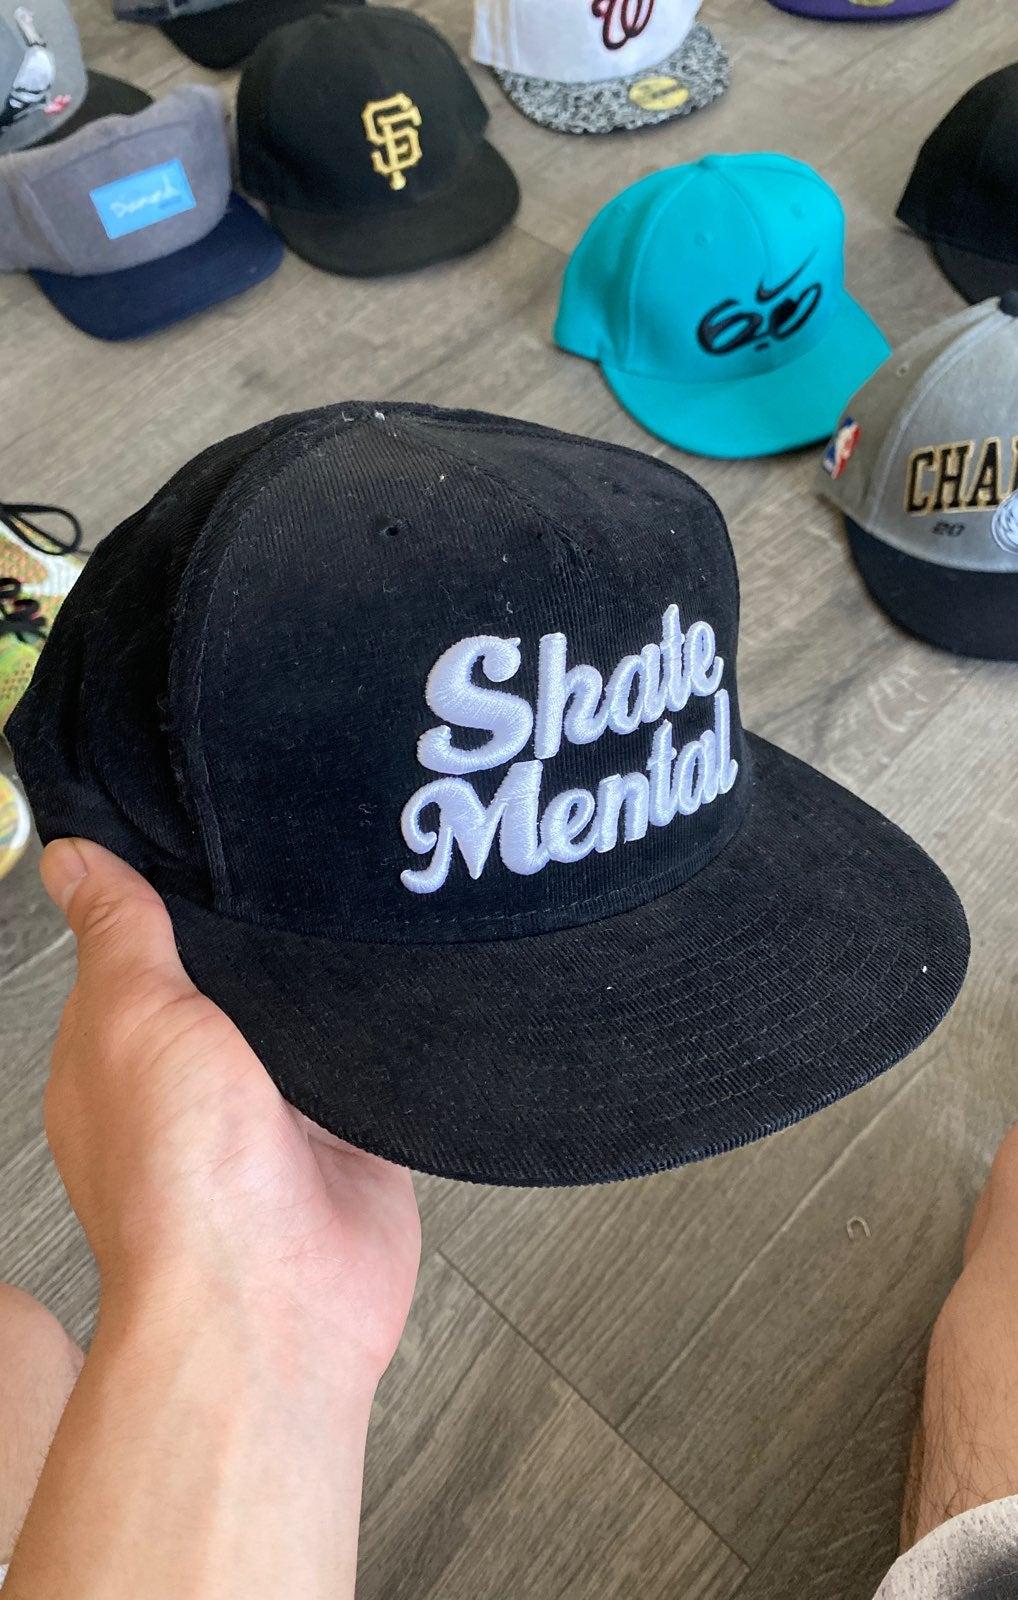 Skate mental corduroy hat